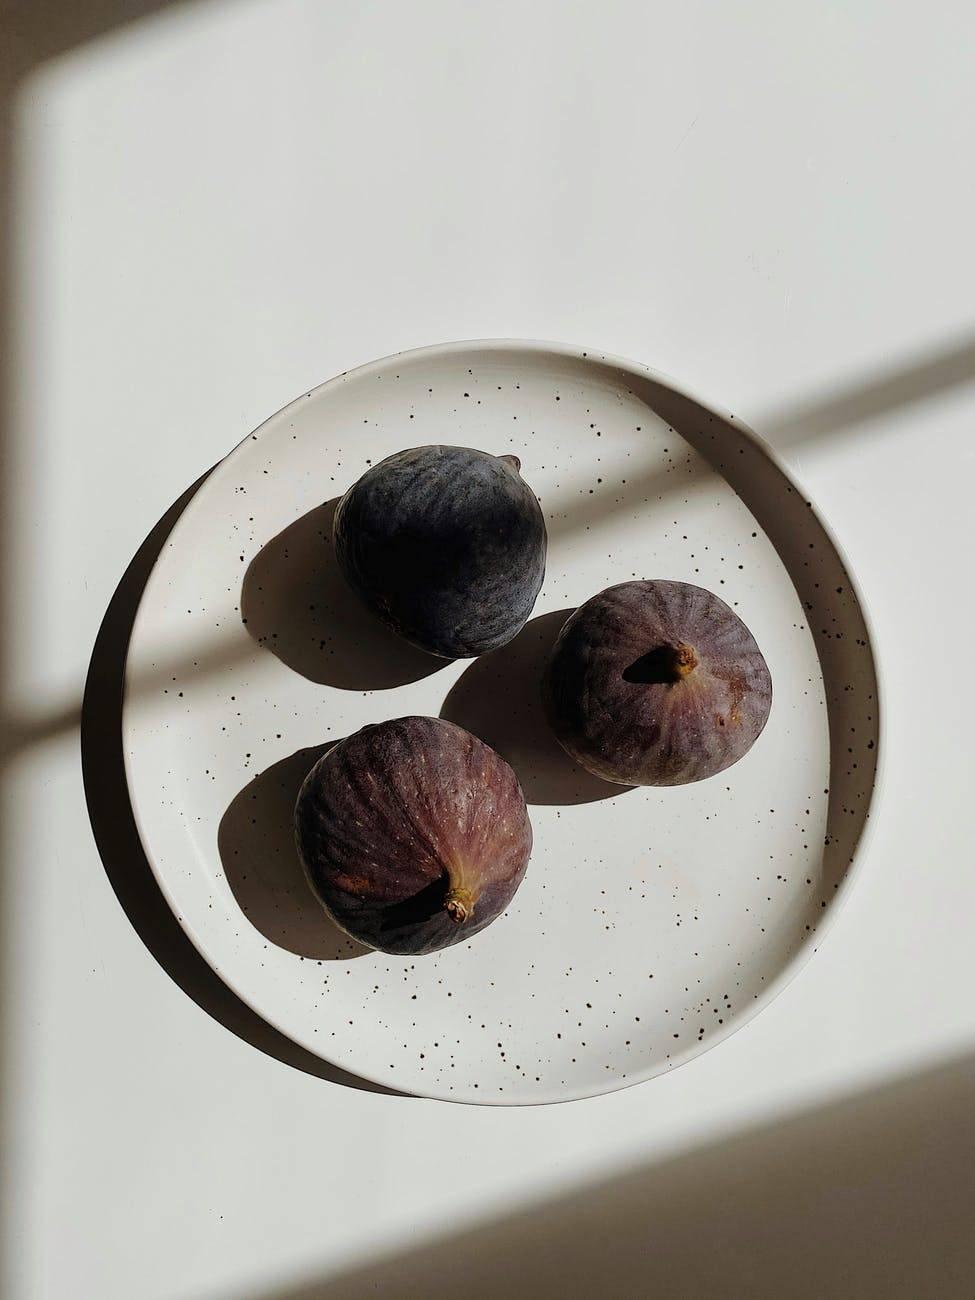 7incir,1 zeytin diyeti faydaları